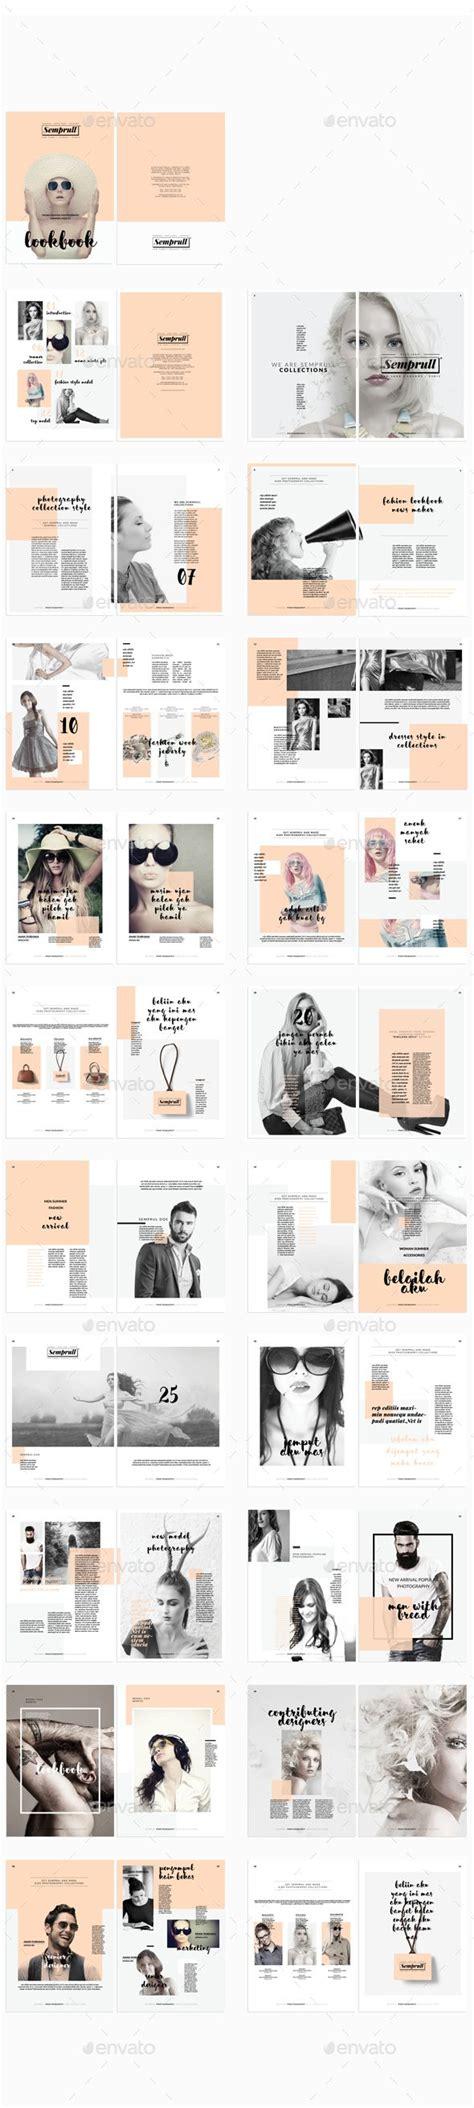 magazine layout my designs pinterest 1 quot layout and best 25 magazine layout design ideas on pinterest